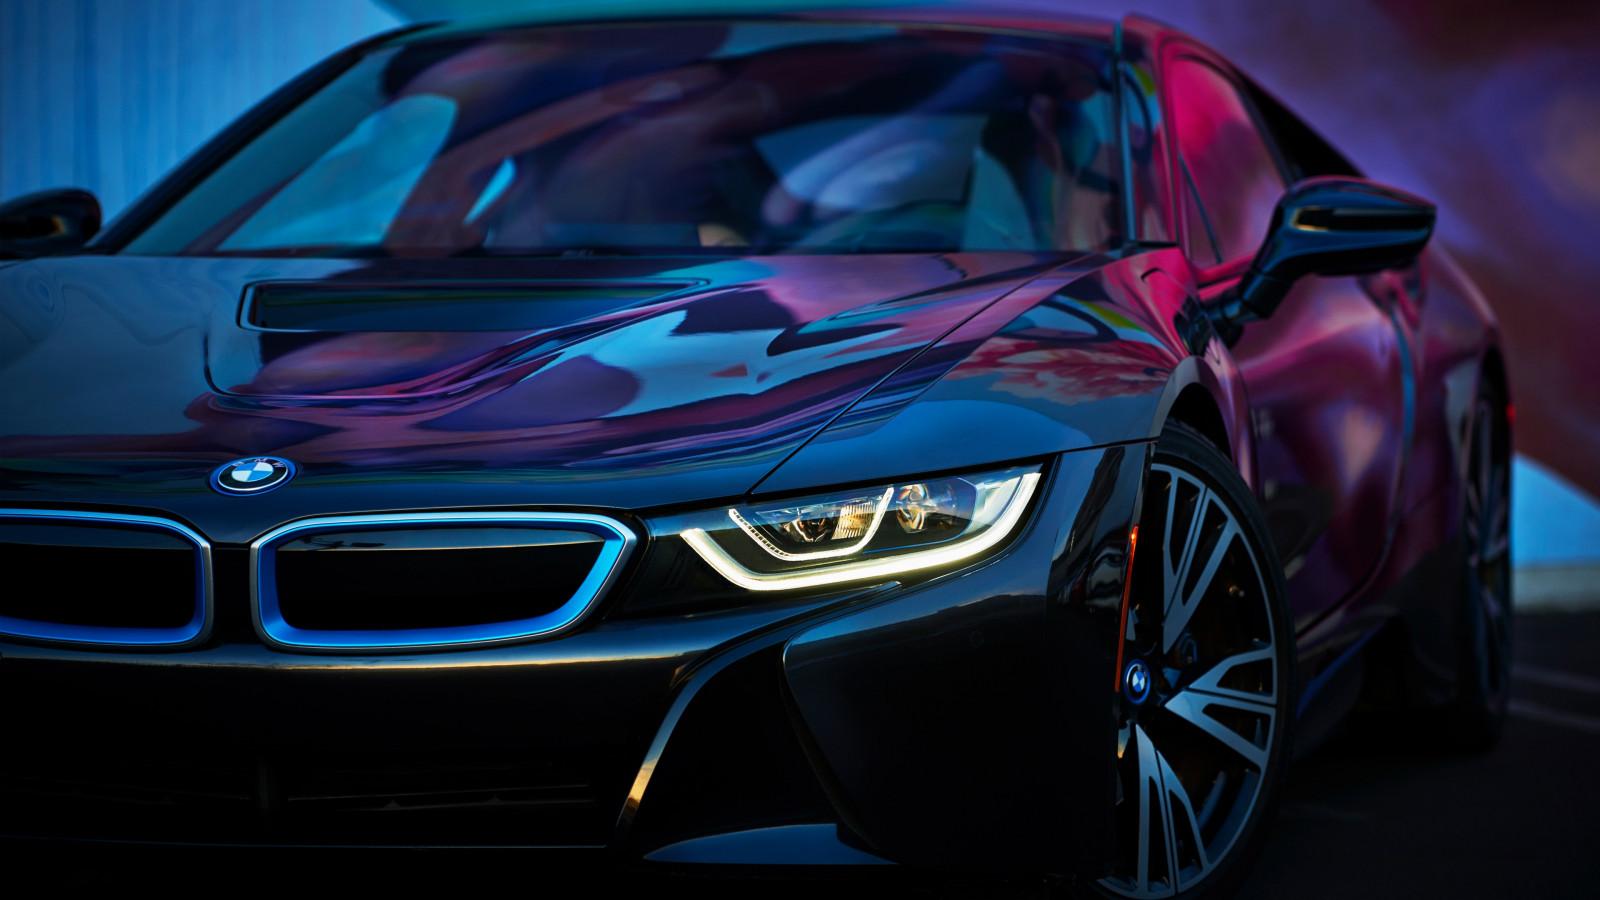 Download wallpaper: BMW i8 1600x900